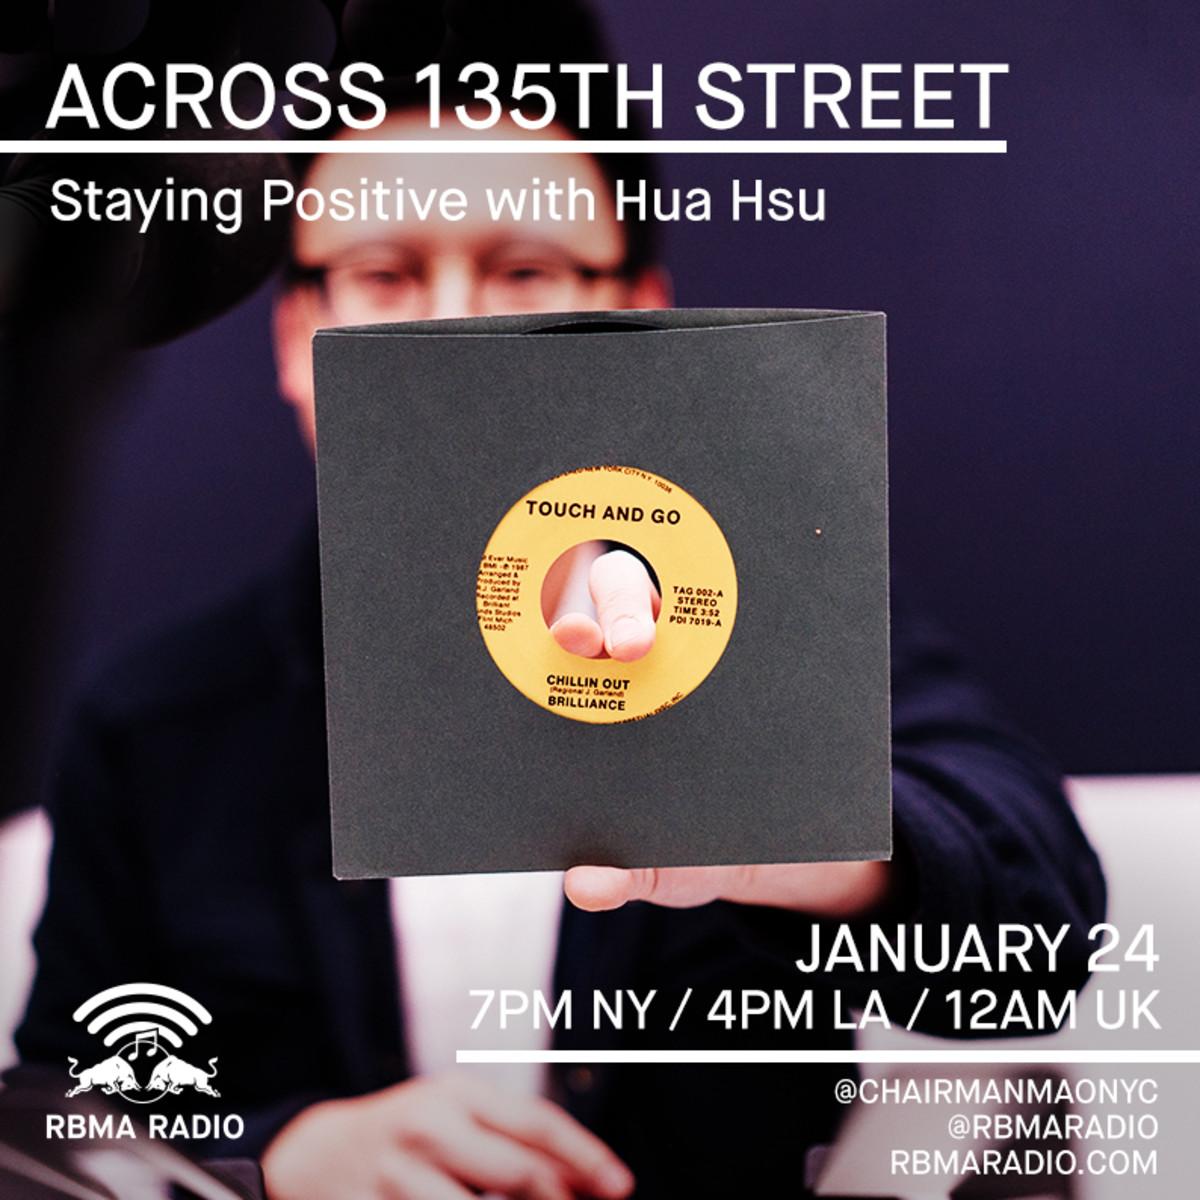 January_24_Across135thStreet